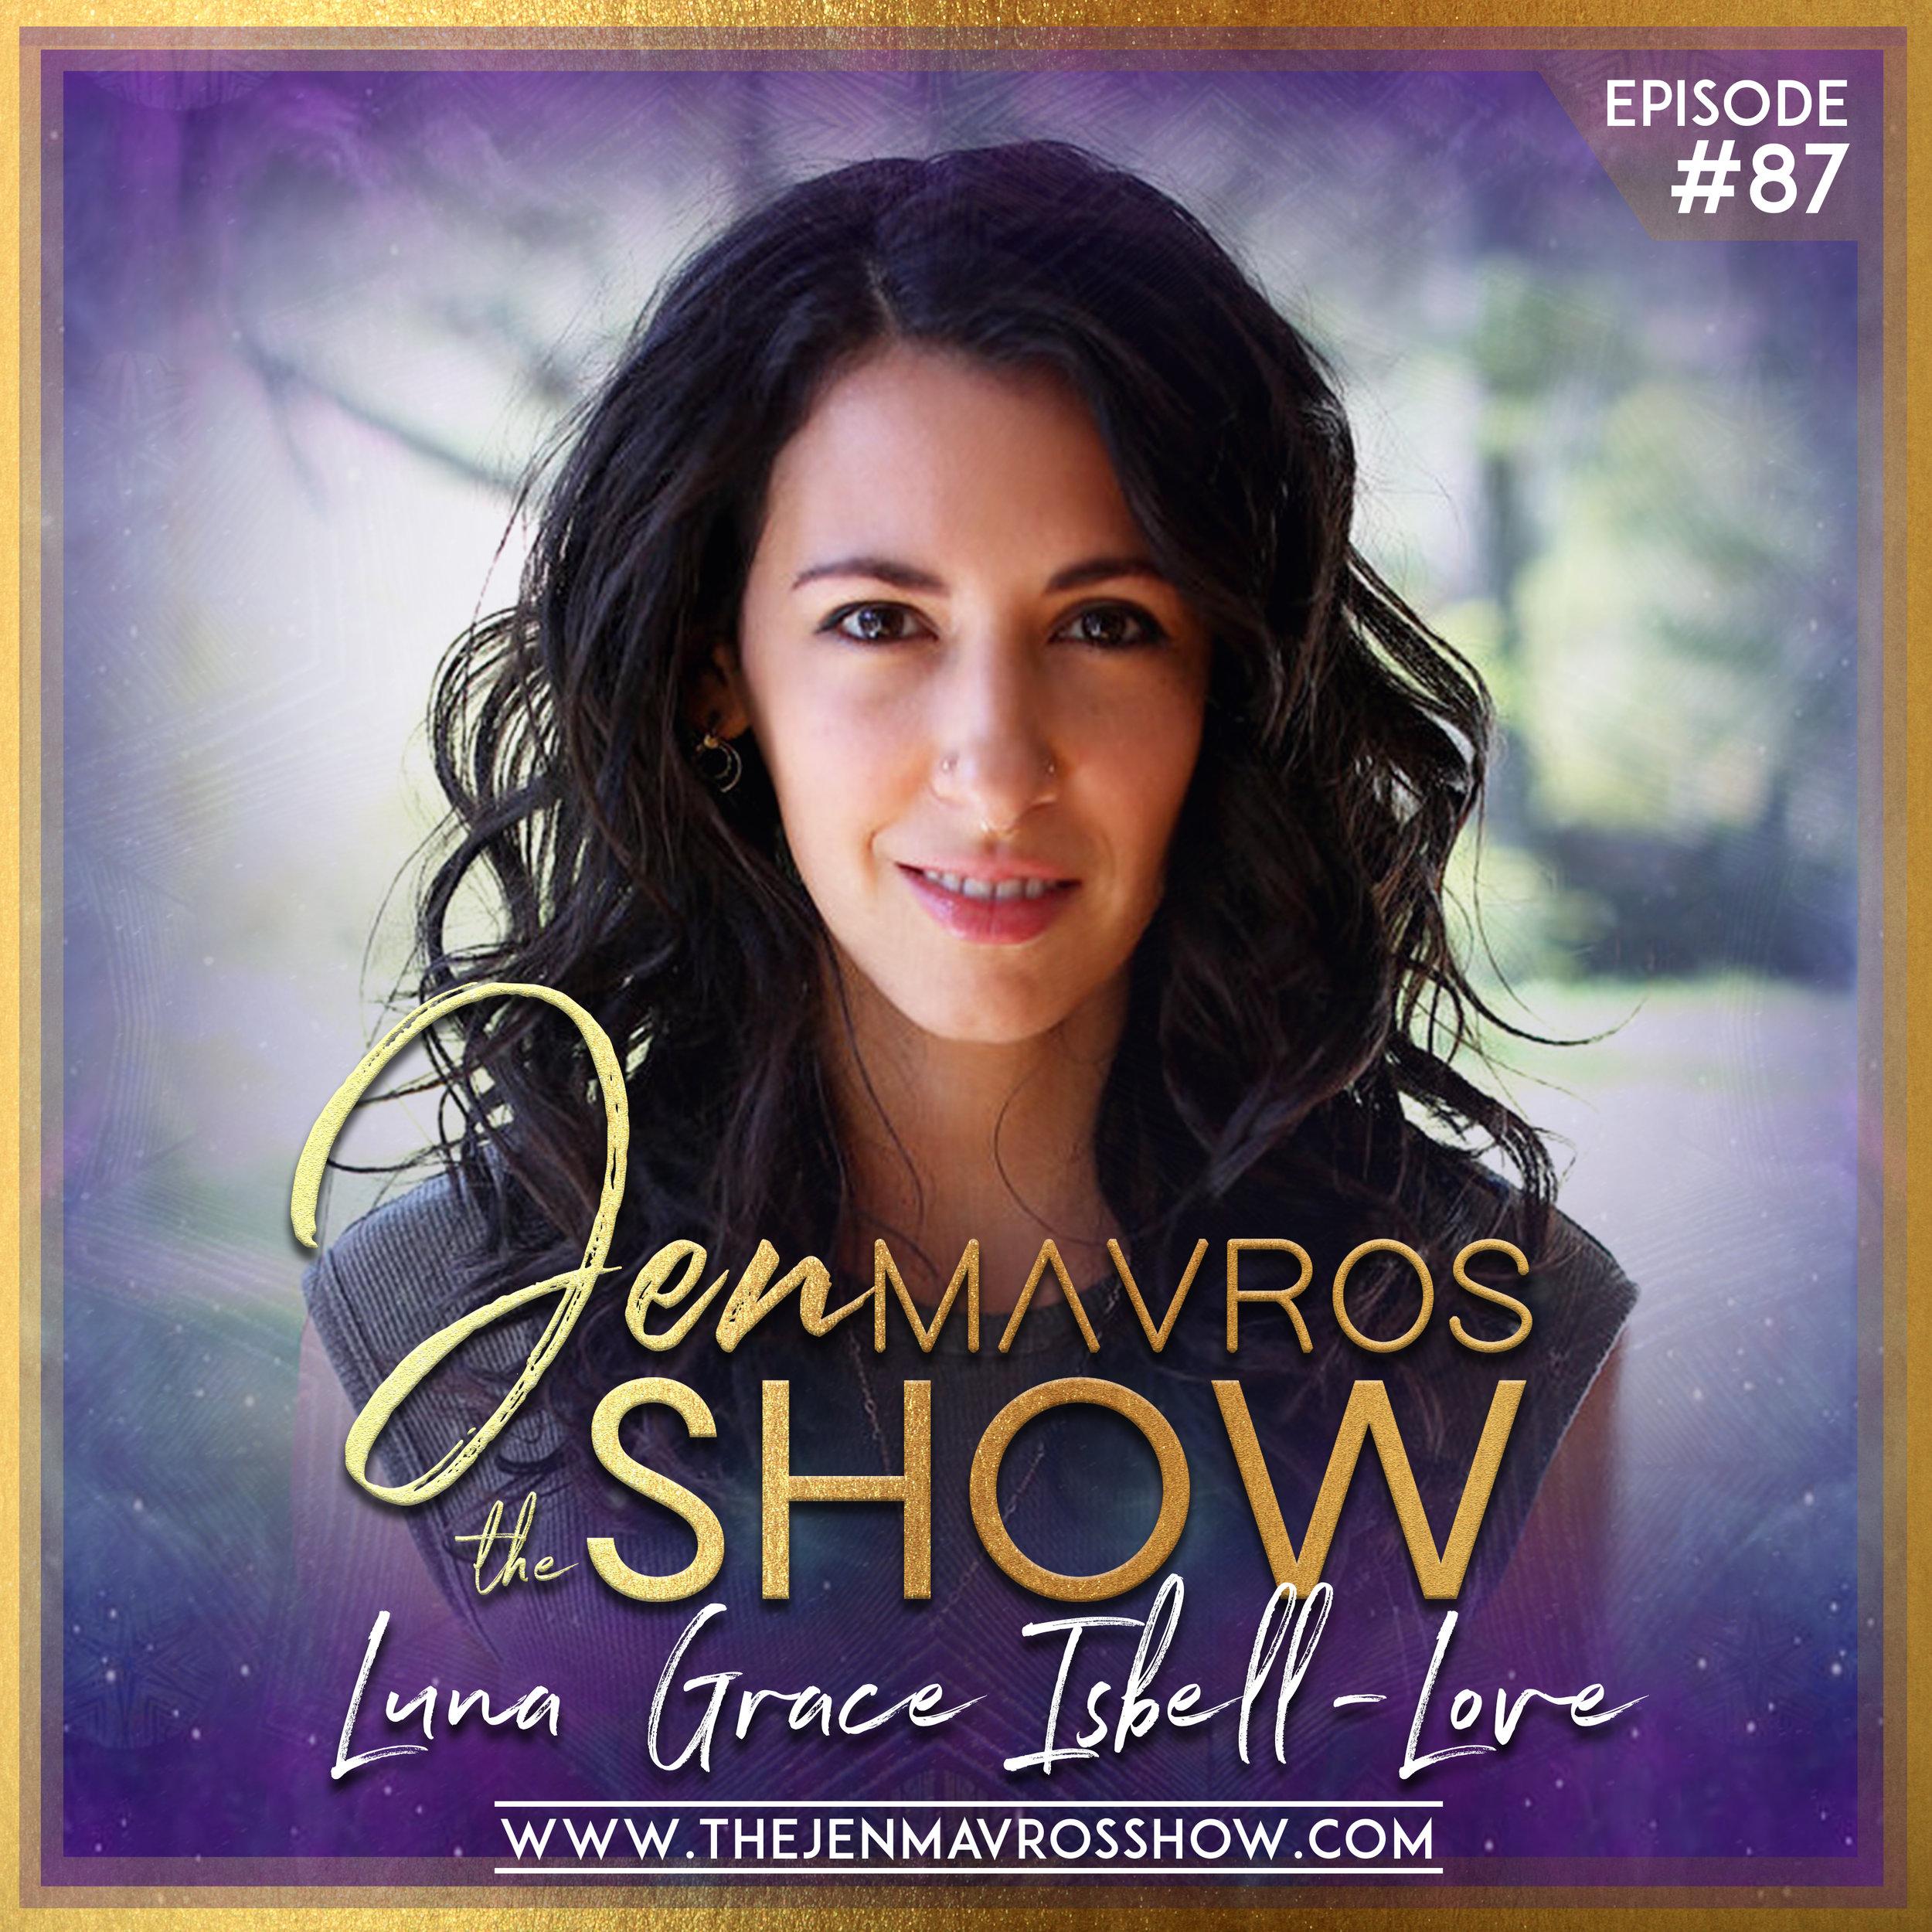 Luna Grace Isbell-Love - The Embodiment of Devotion